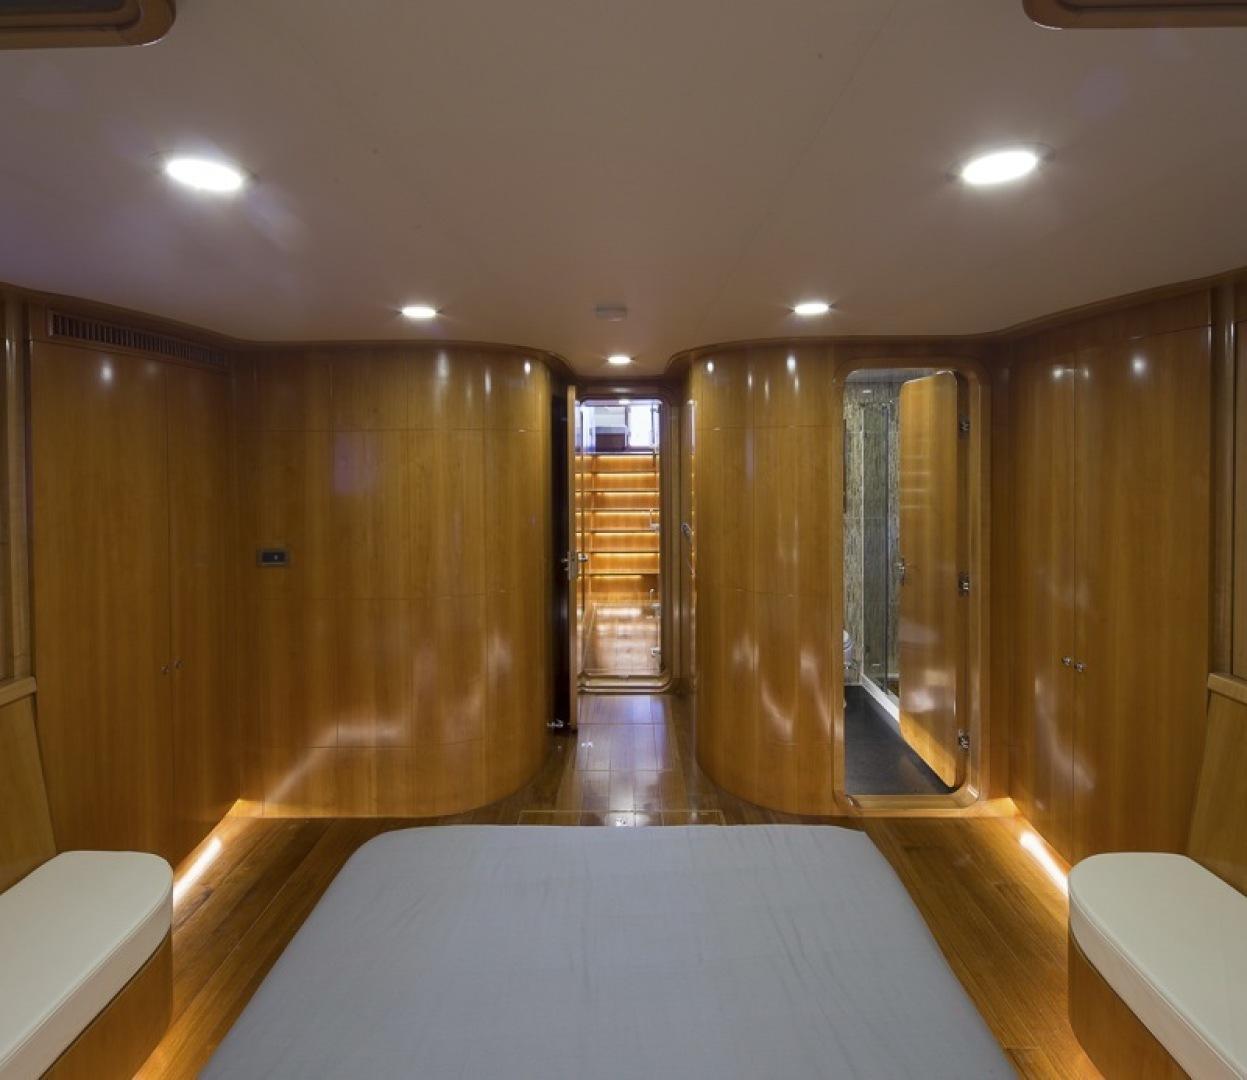 Bering-65 Bering Yacht 2013-Namaste Dania-Florida-United States-1400996   Thumbnail